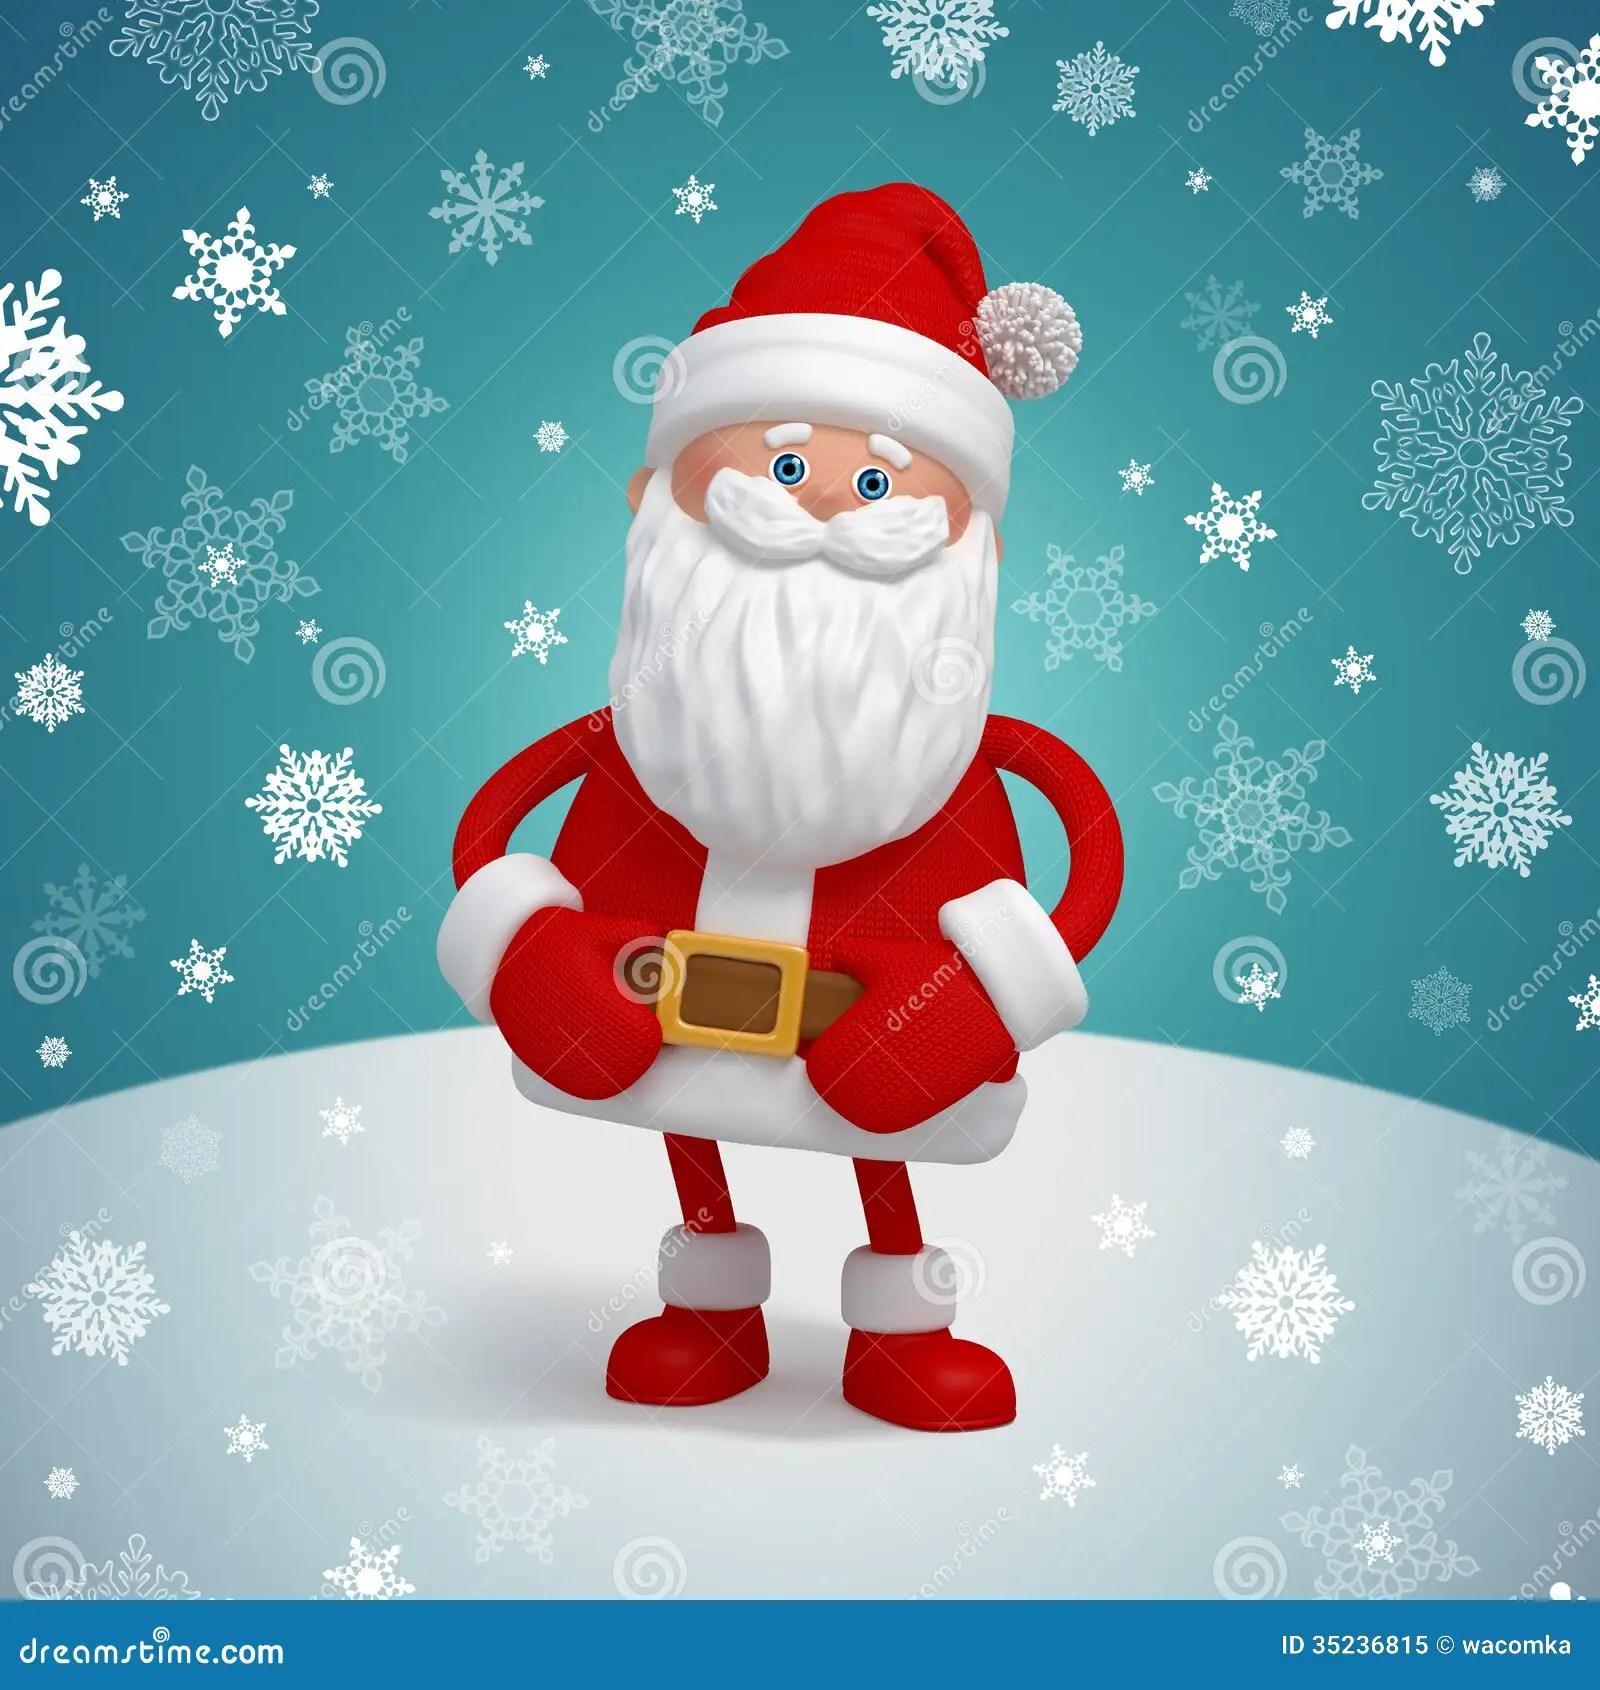 Christmas Wallpaper Snow Falling Personaje De Dibujos Animados Lindo De 3d Santa Claus Foto